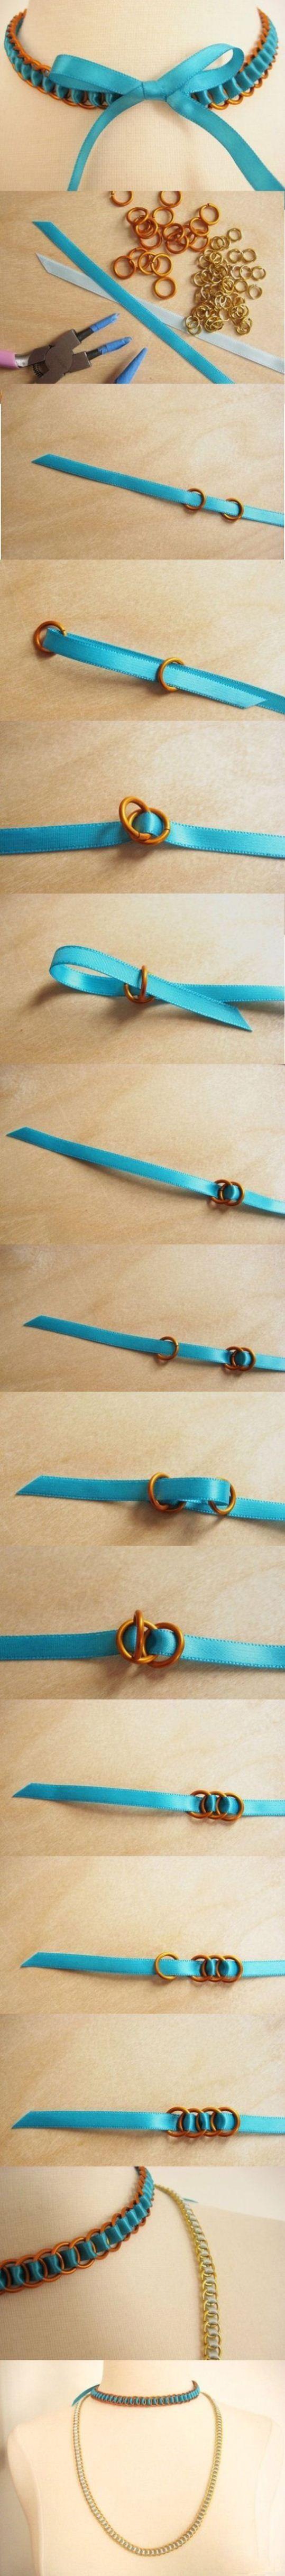 stylish bags DIY Fashion Necklace  Crafts